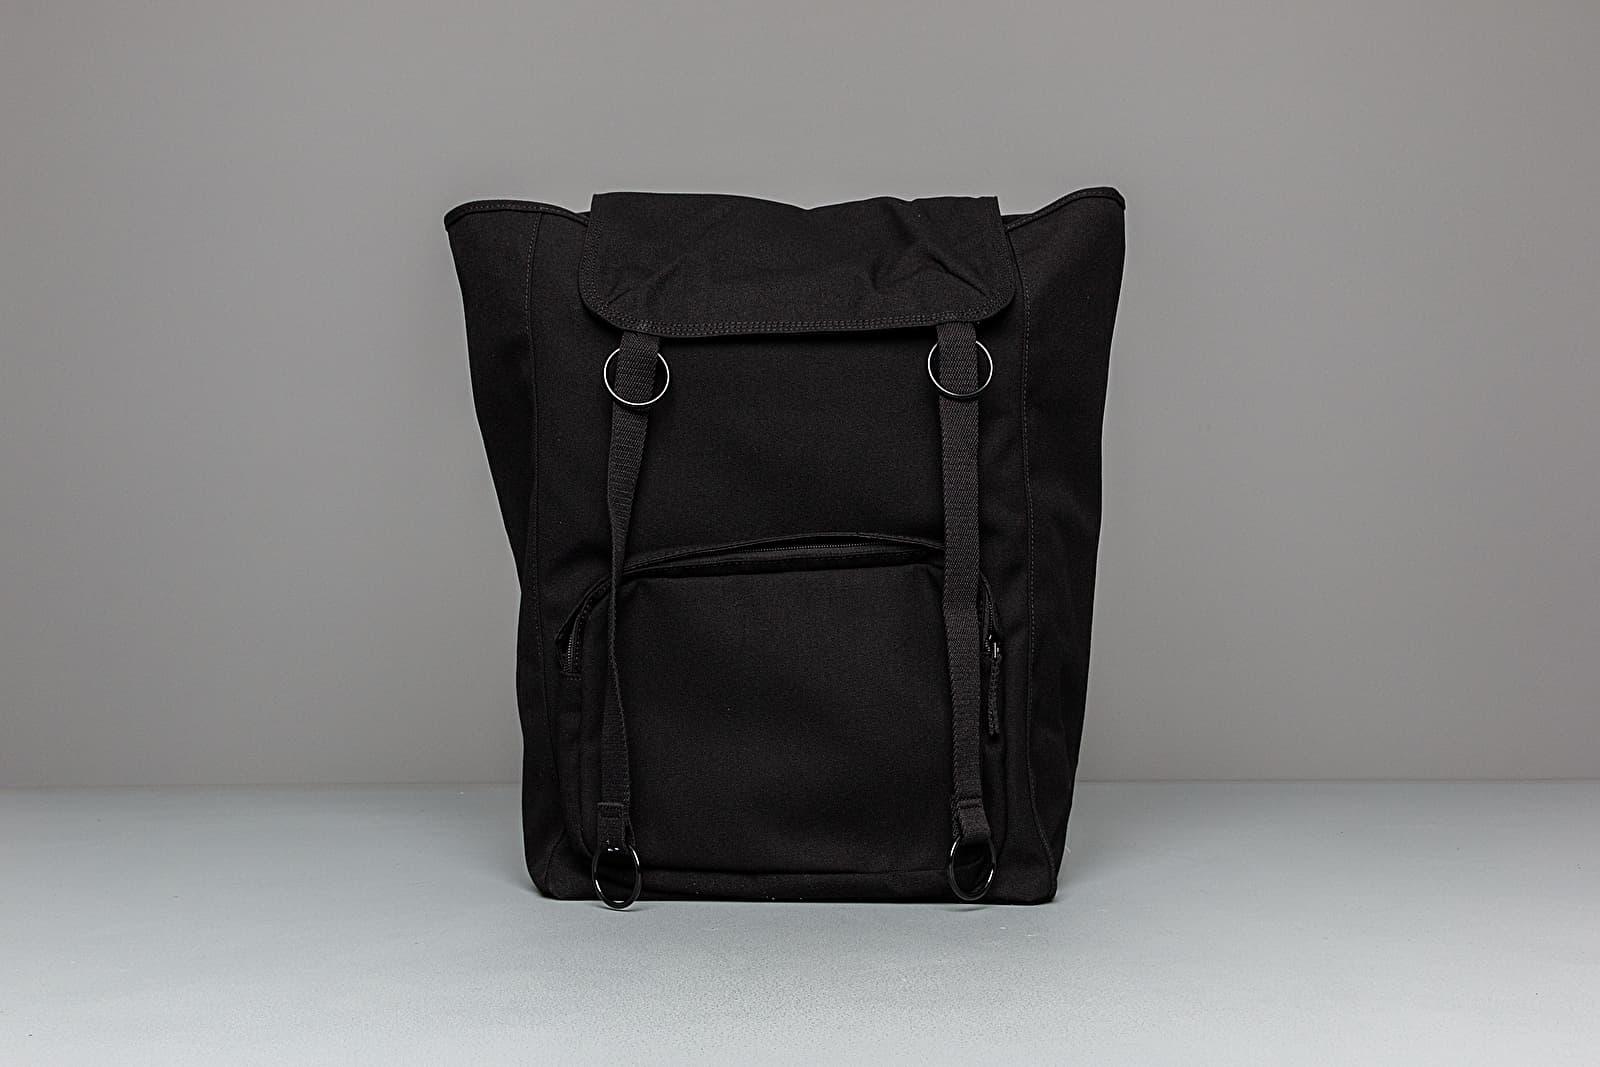 Eastpak x Raf Simons Topload Loop Bag